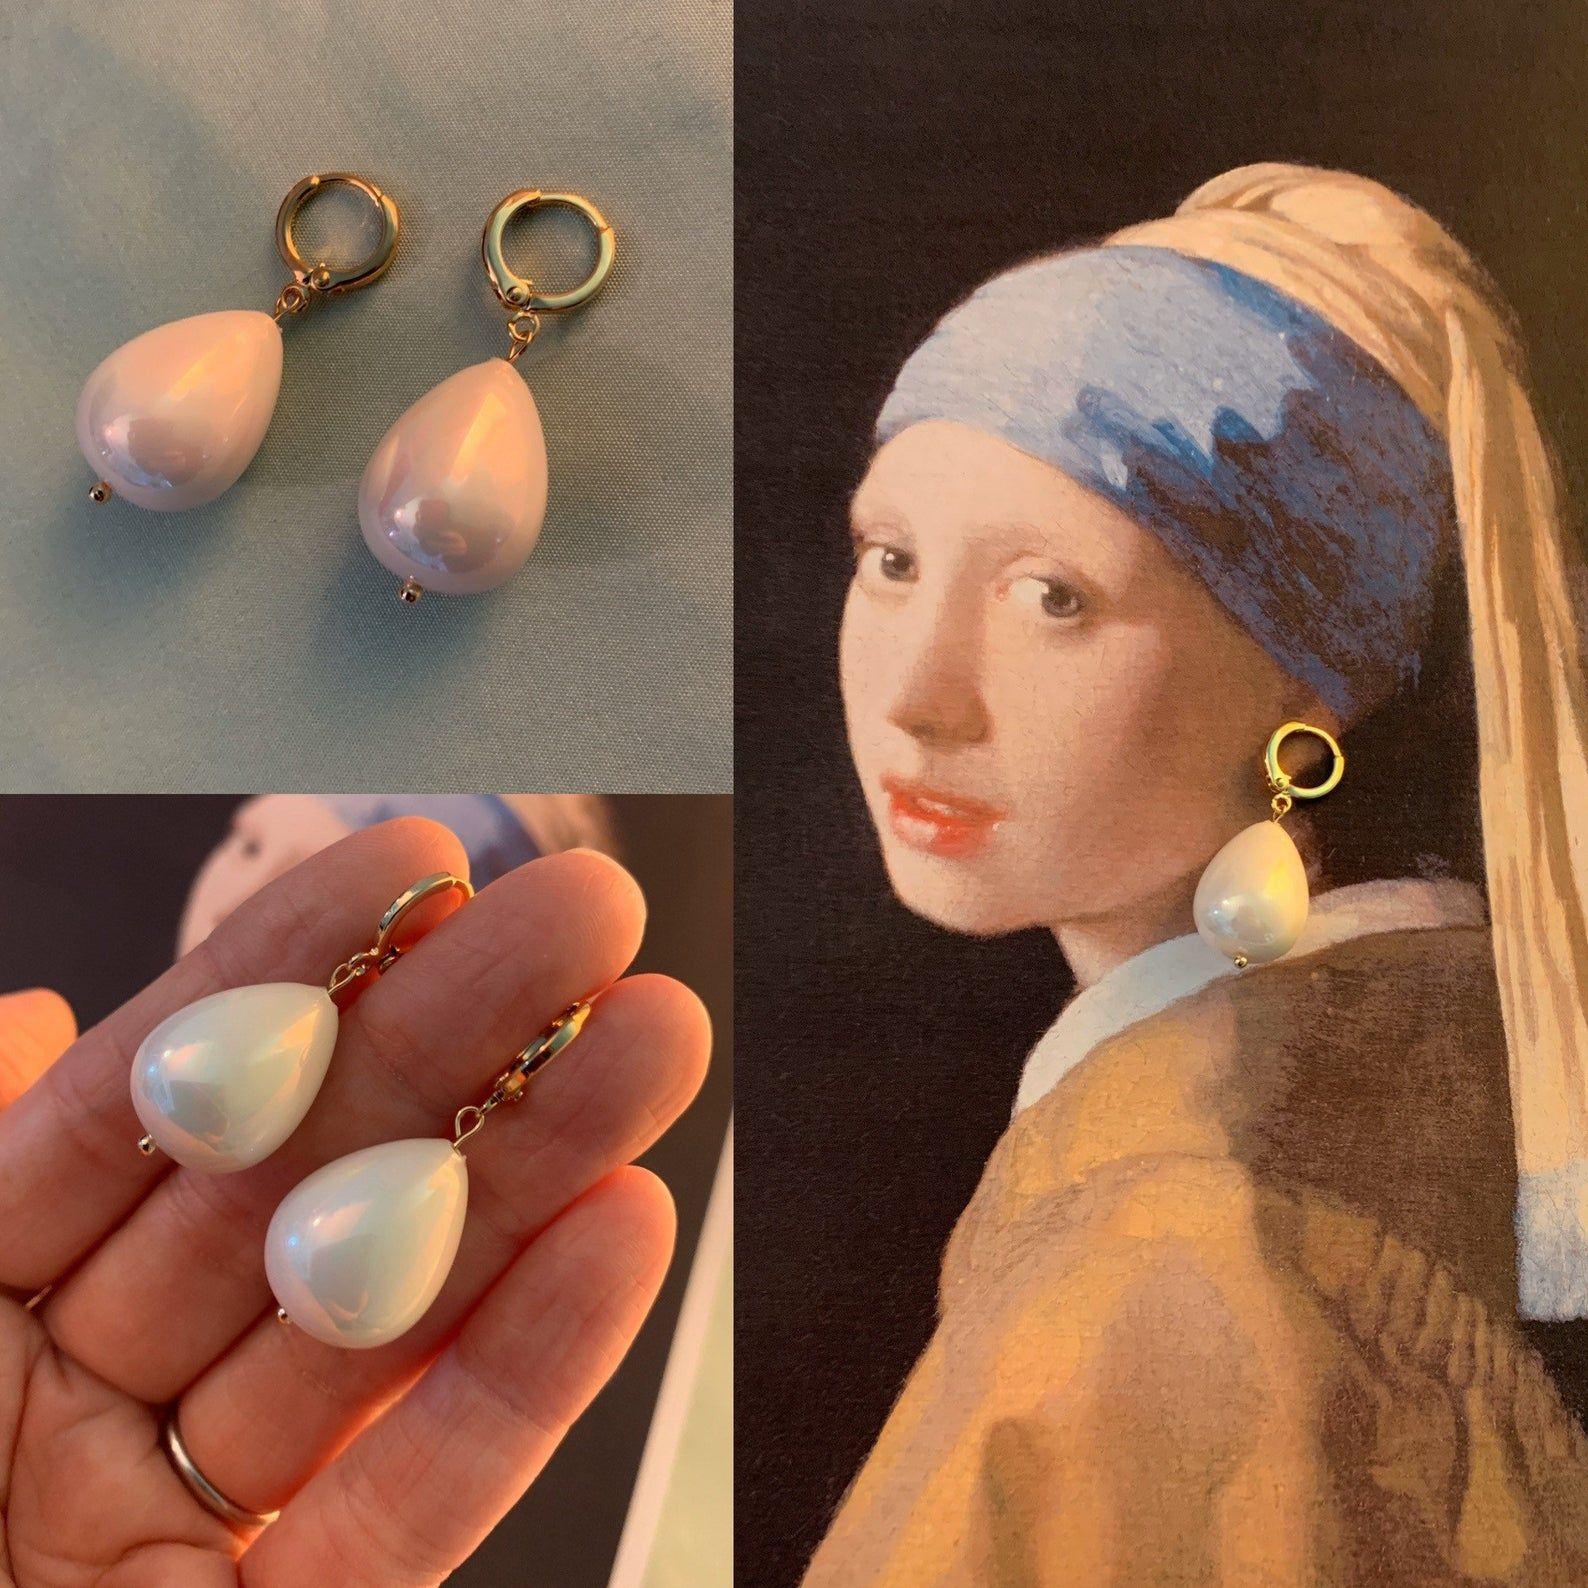 16k gold plated brass loops HUGE Champagne PEARL Earrings Large SHELL Pearl Teardrops Large dark Champagne Pearl Heavy earrings